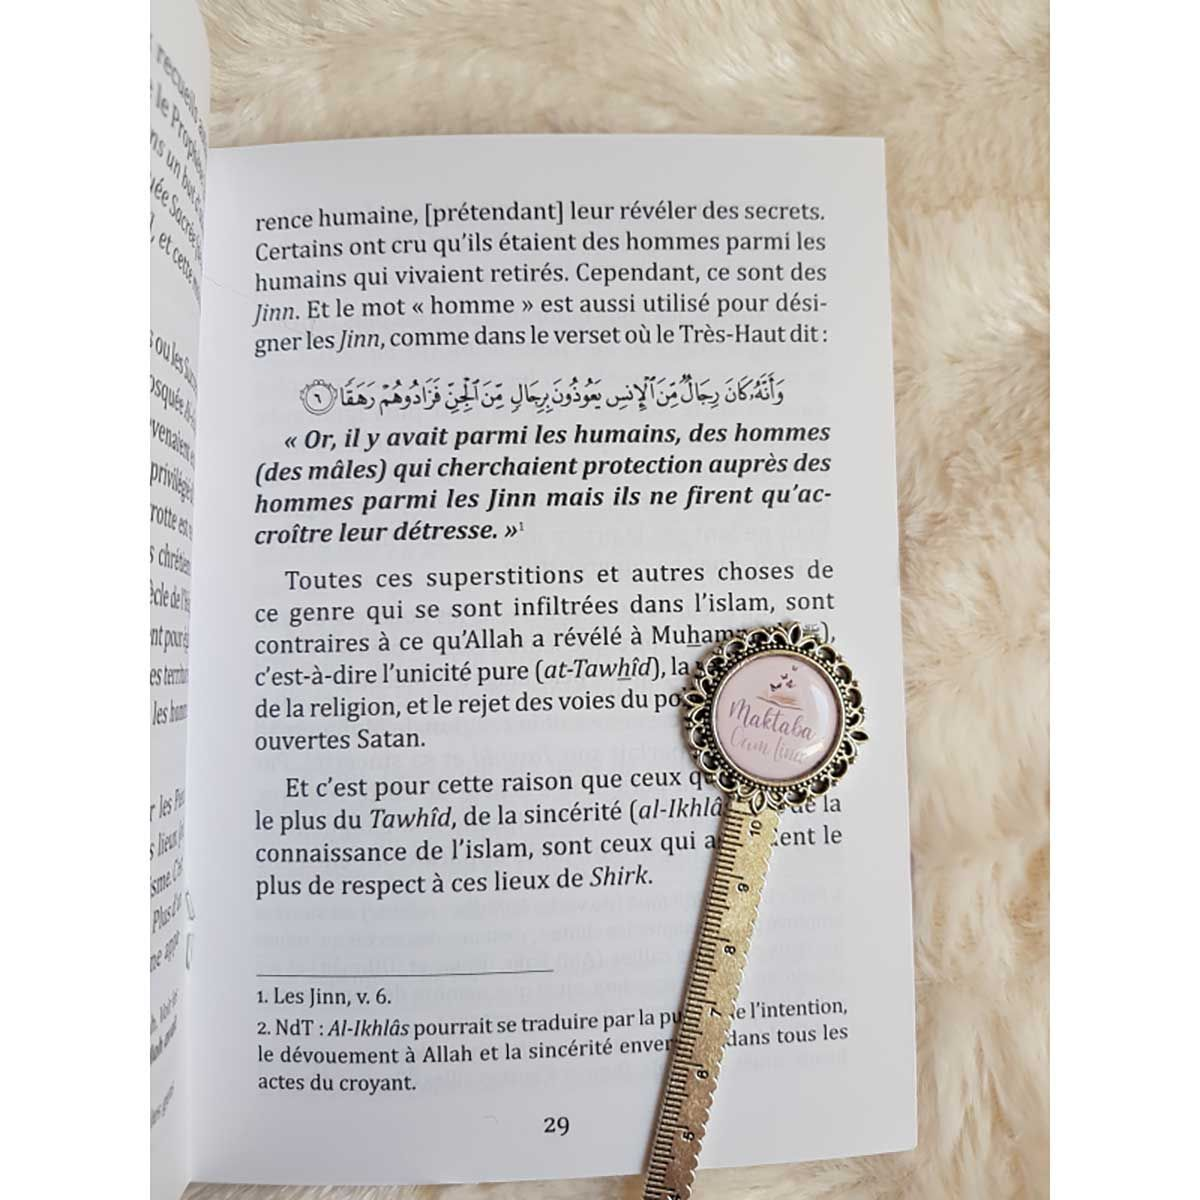 Ce qui distingue le musulman du polythéiste - Cheikh Mohammed Ibn Abdel Wahhâb